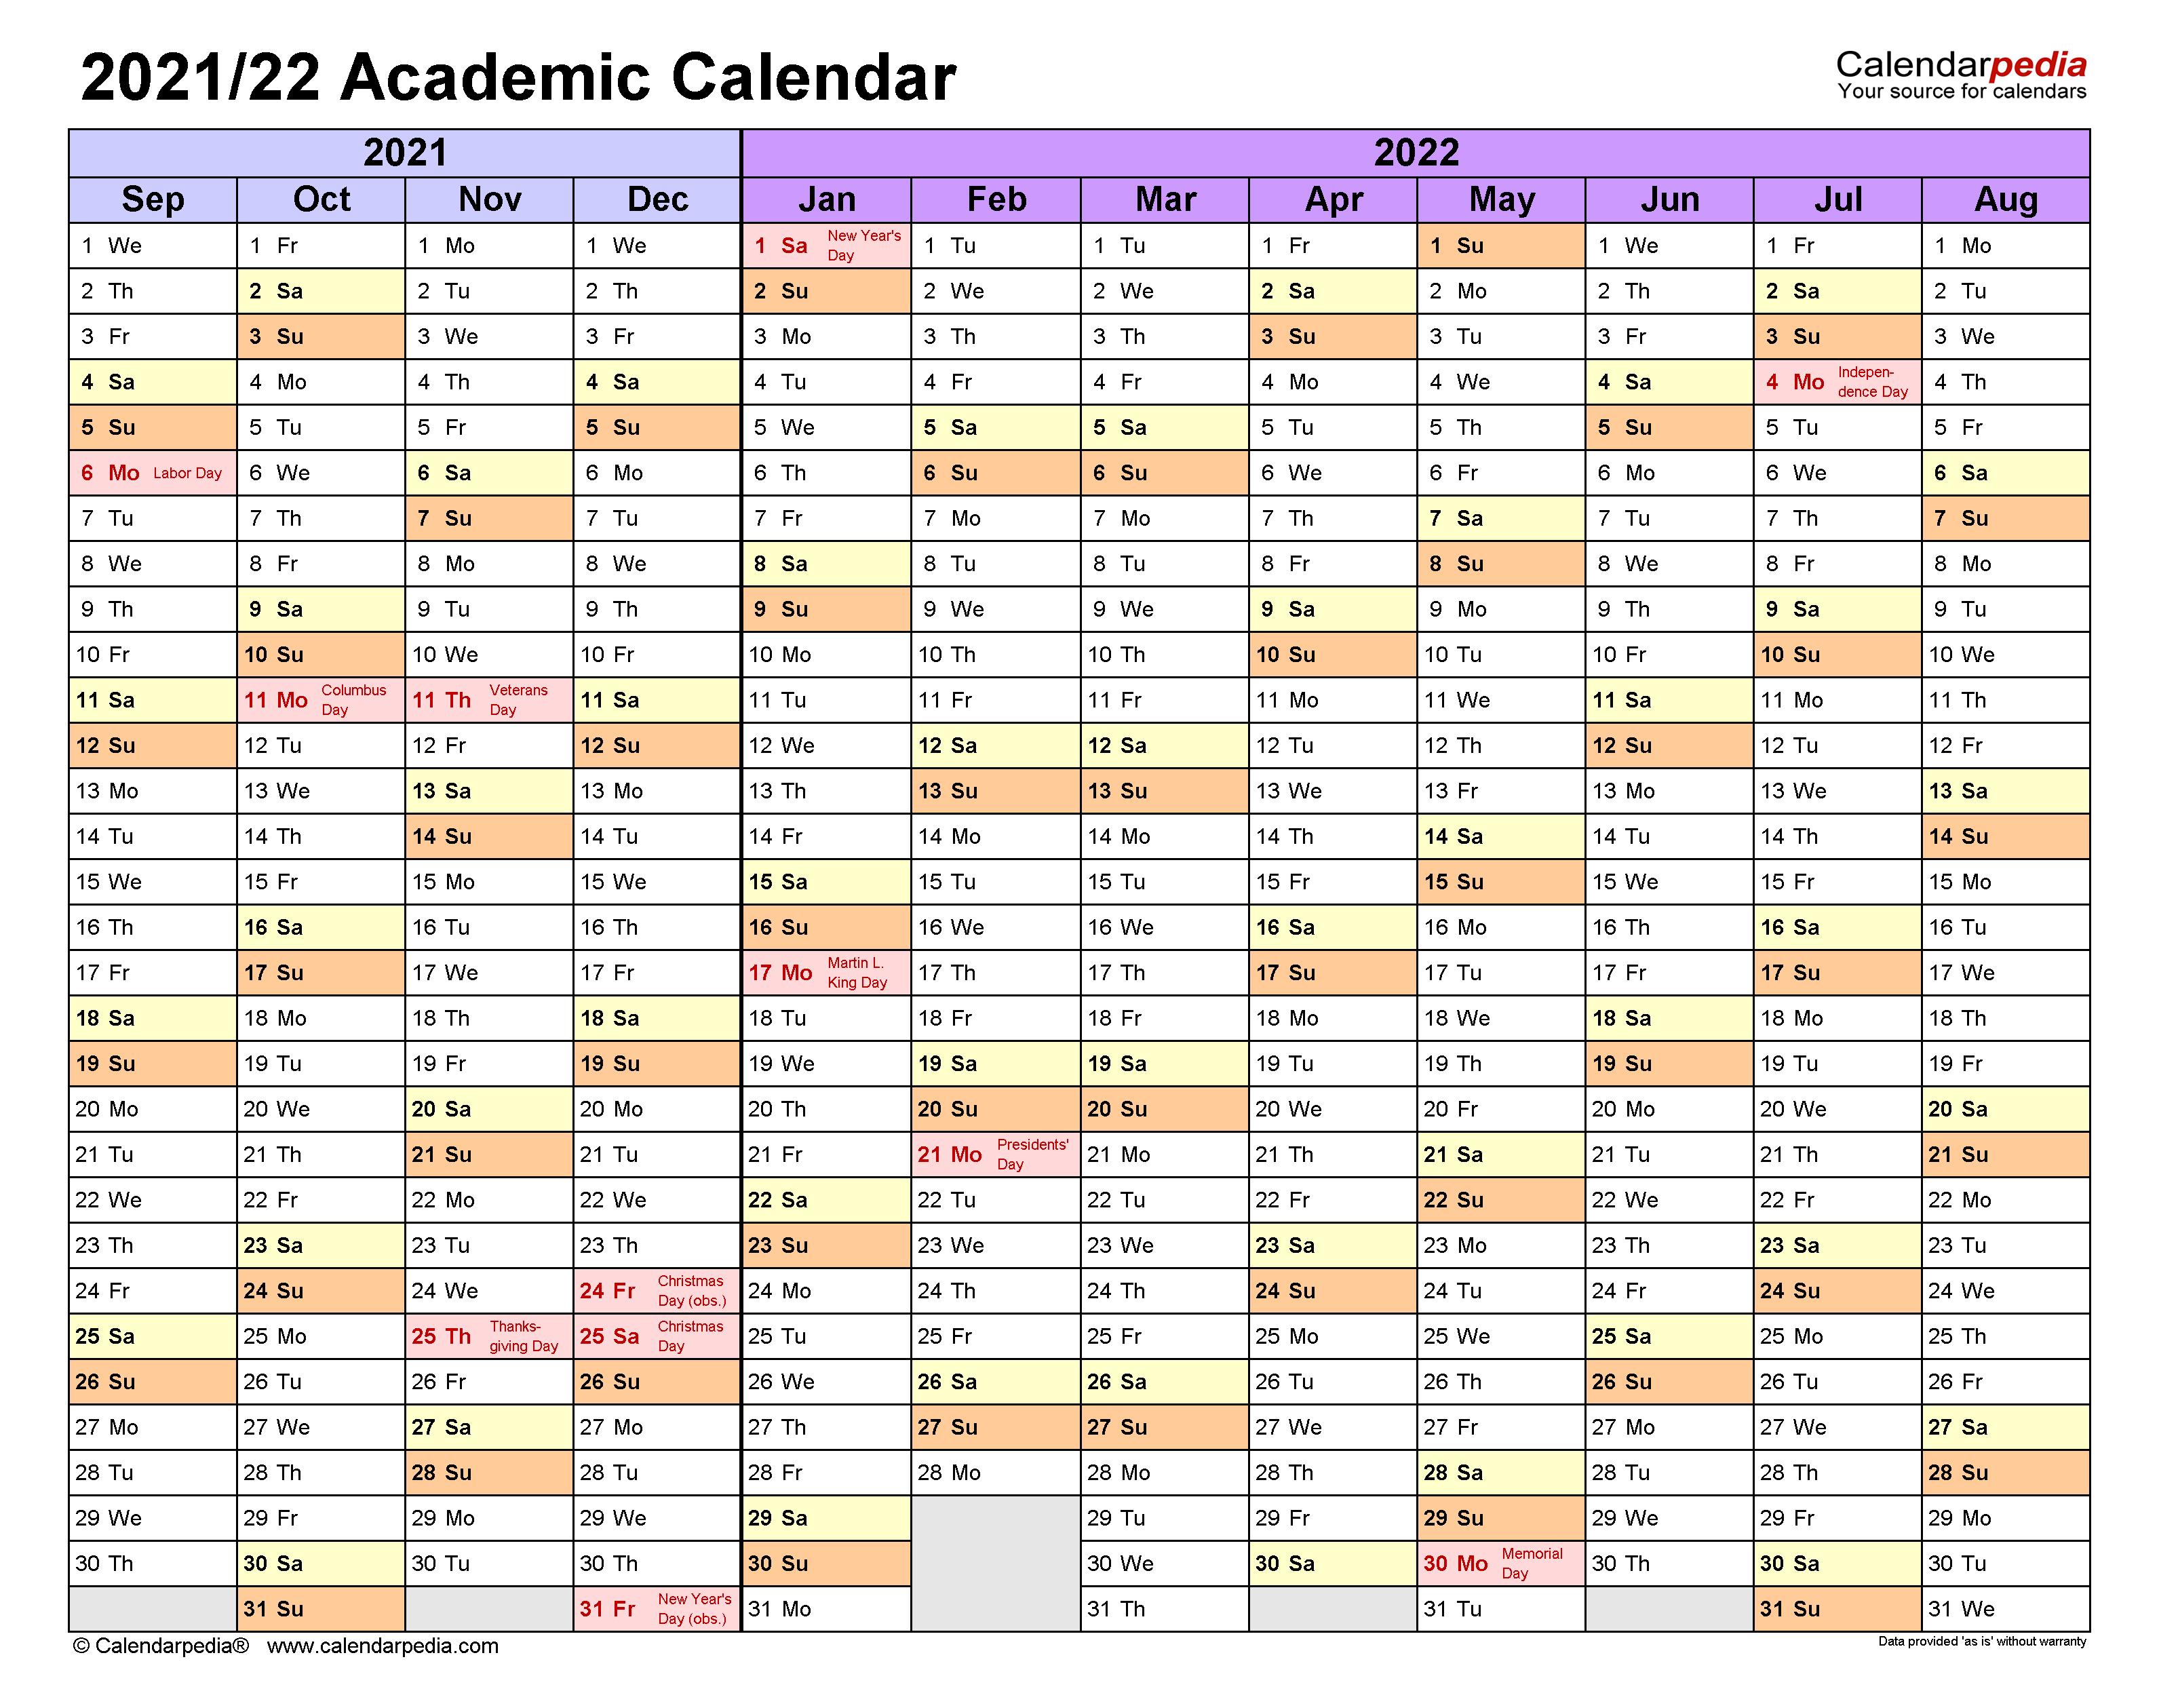 Excel Academic Calendar 2021-22 Images